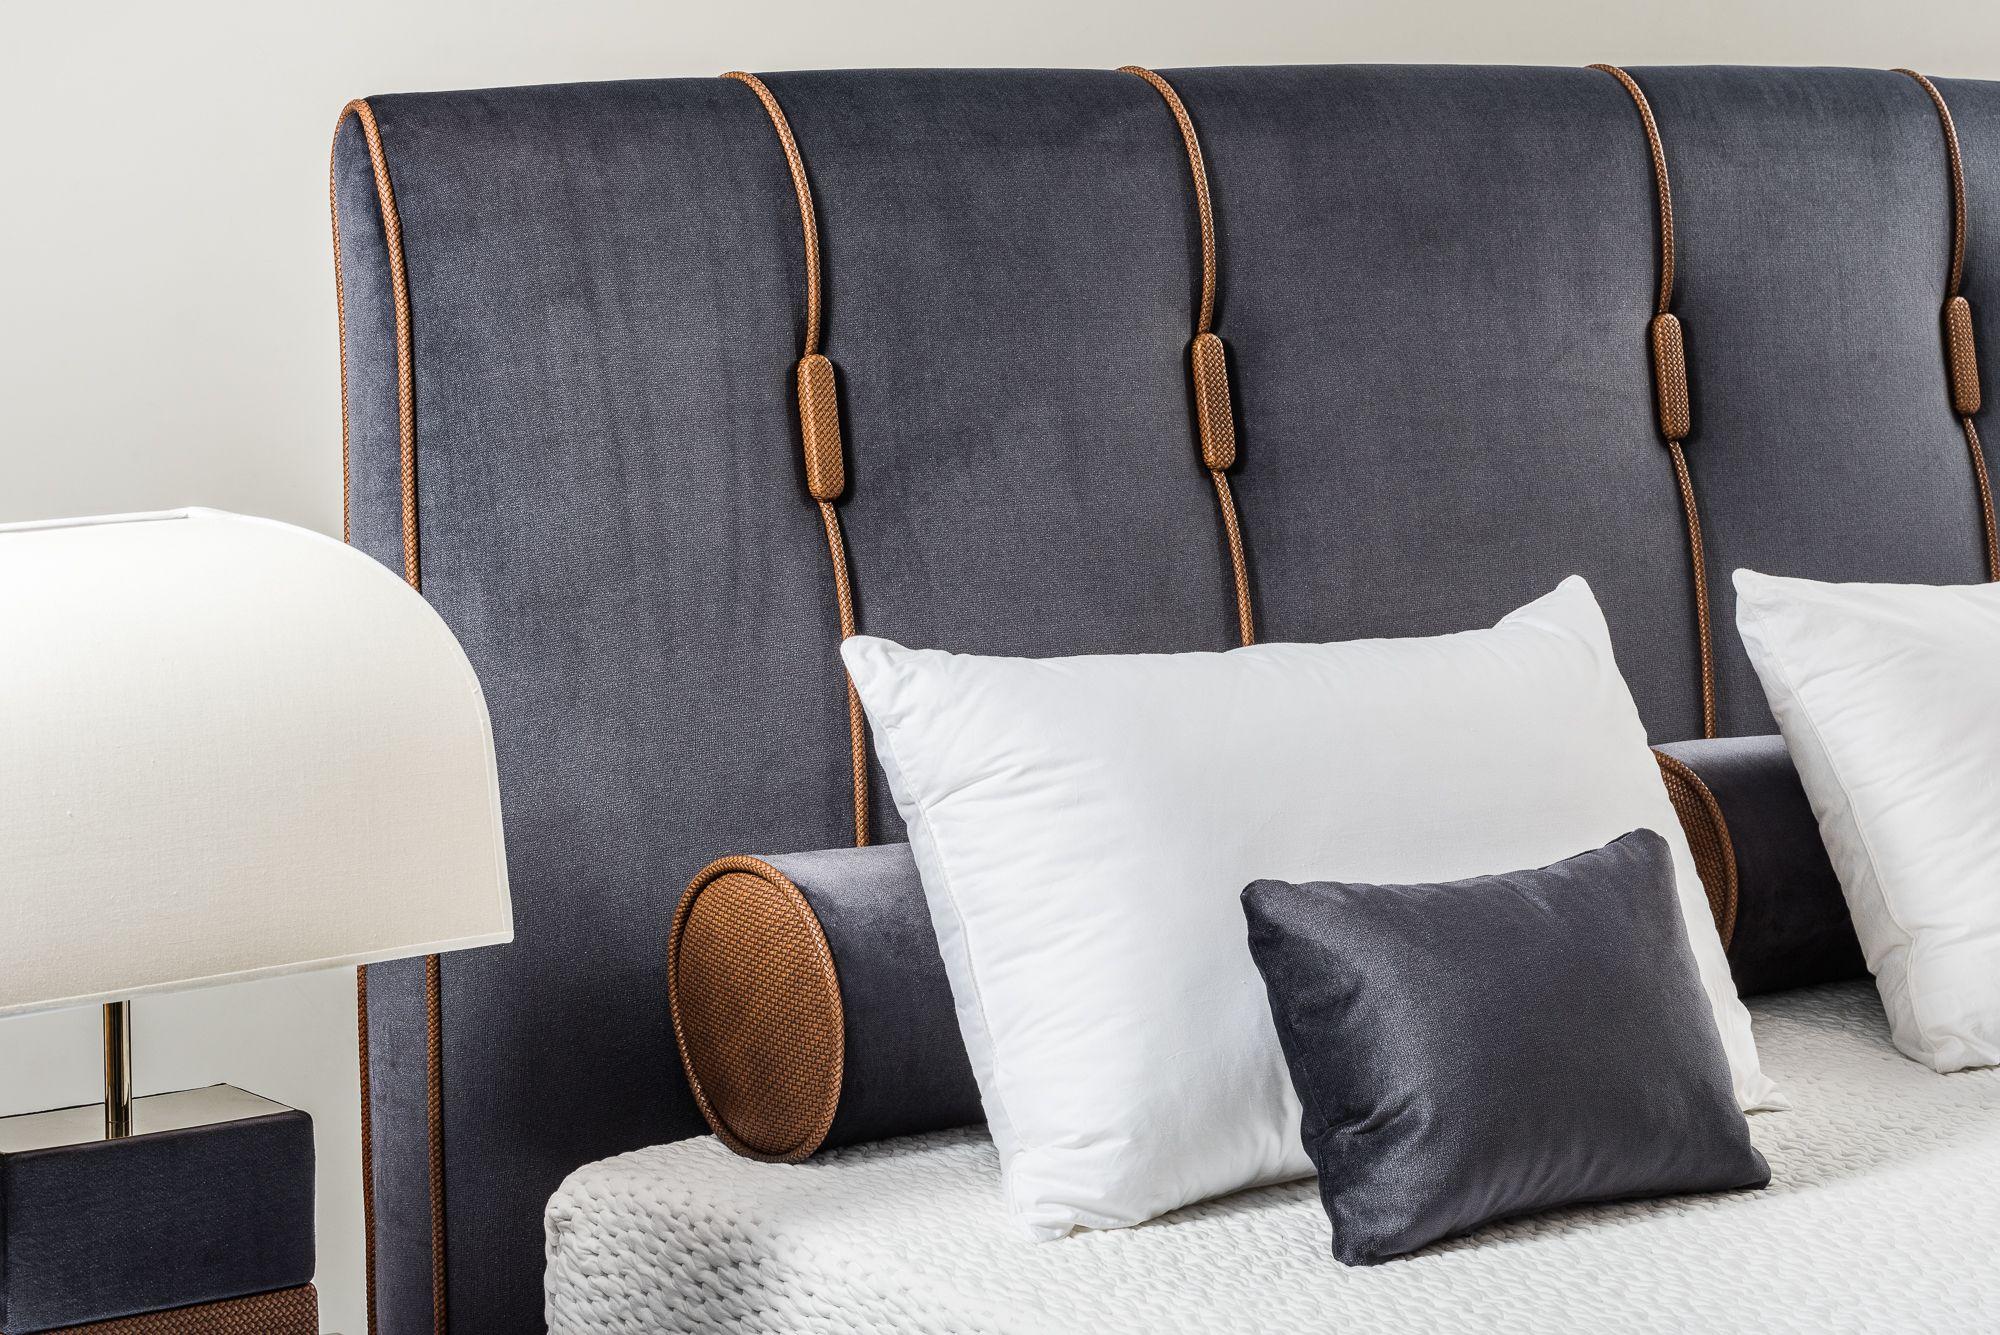 Benjamin Headboard By Colunex Bed Headboard Design Leather Headboard Bedroom Headboards For Beds